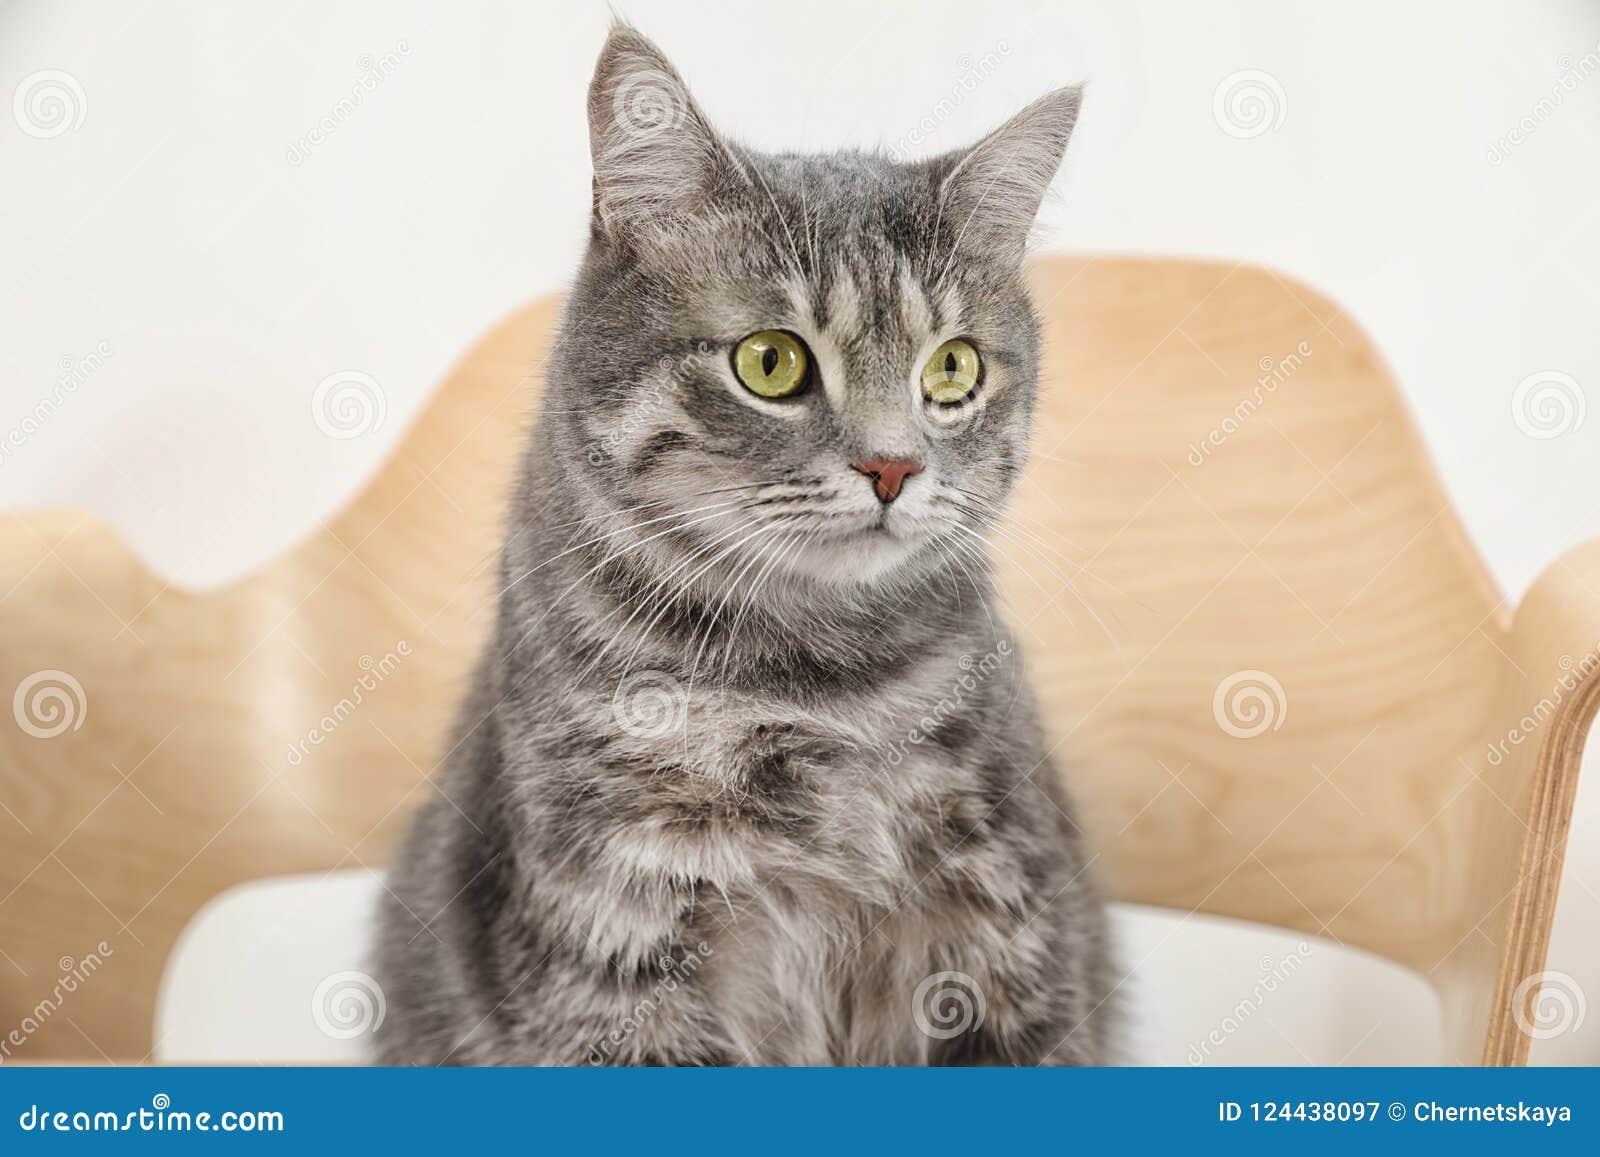 Adorable grey tabby cat on chair